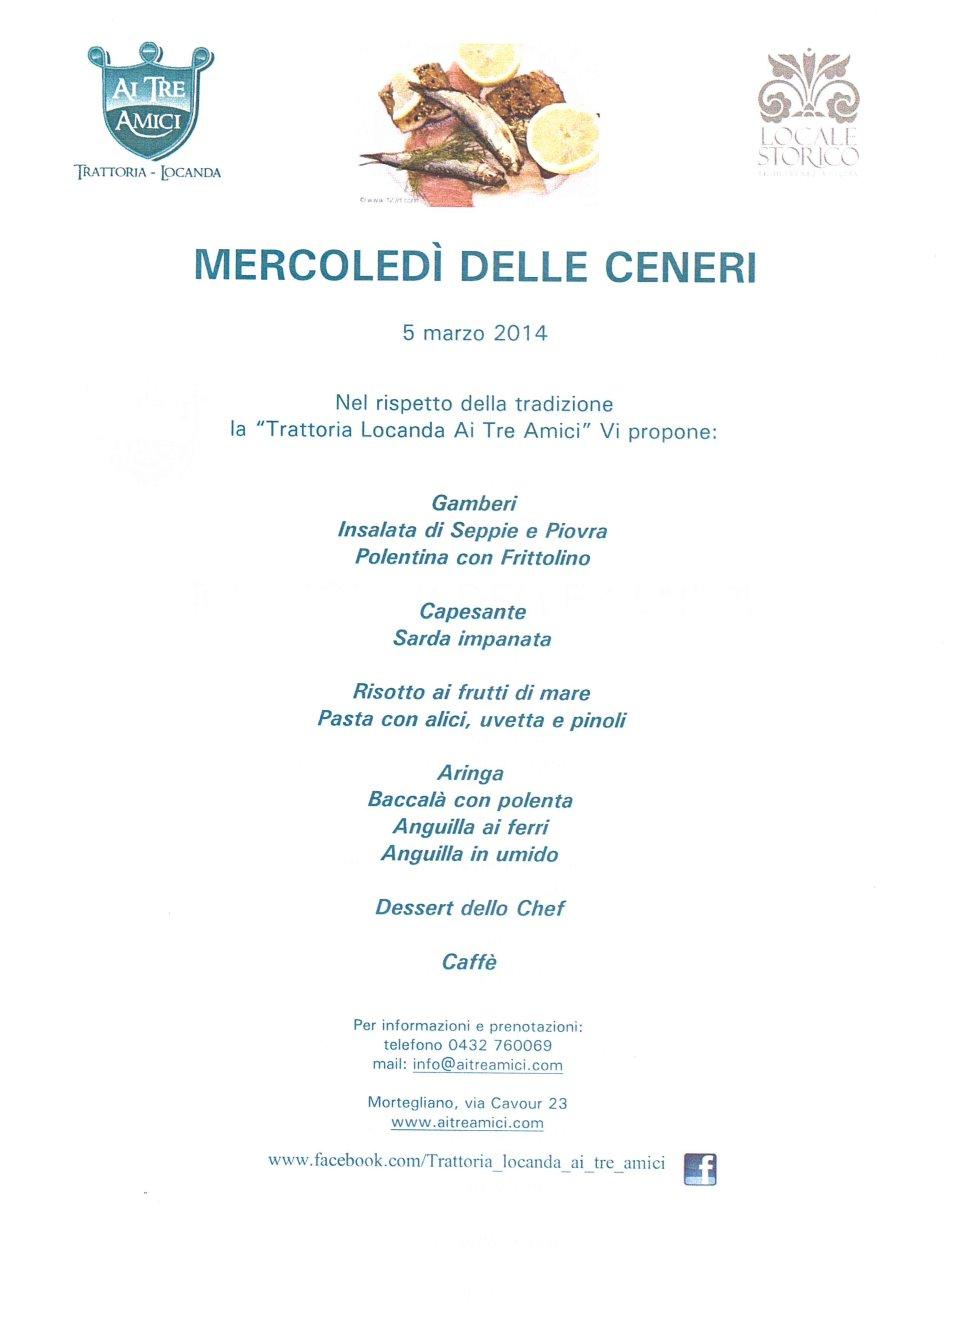 MERCOLEDI' DELLE CENERI